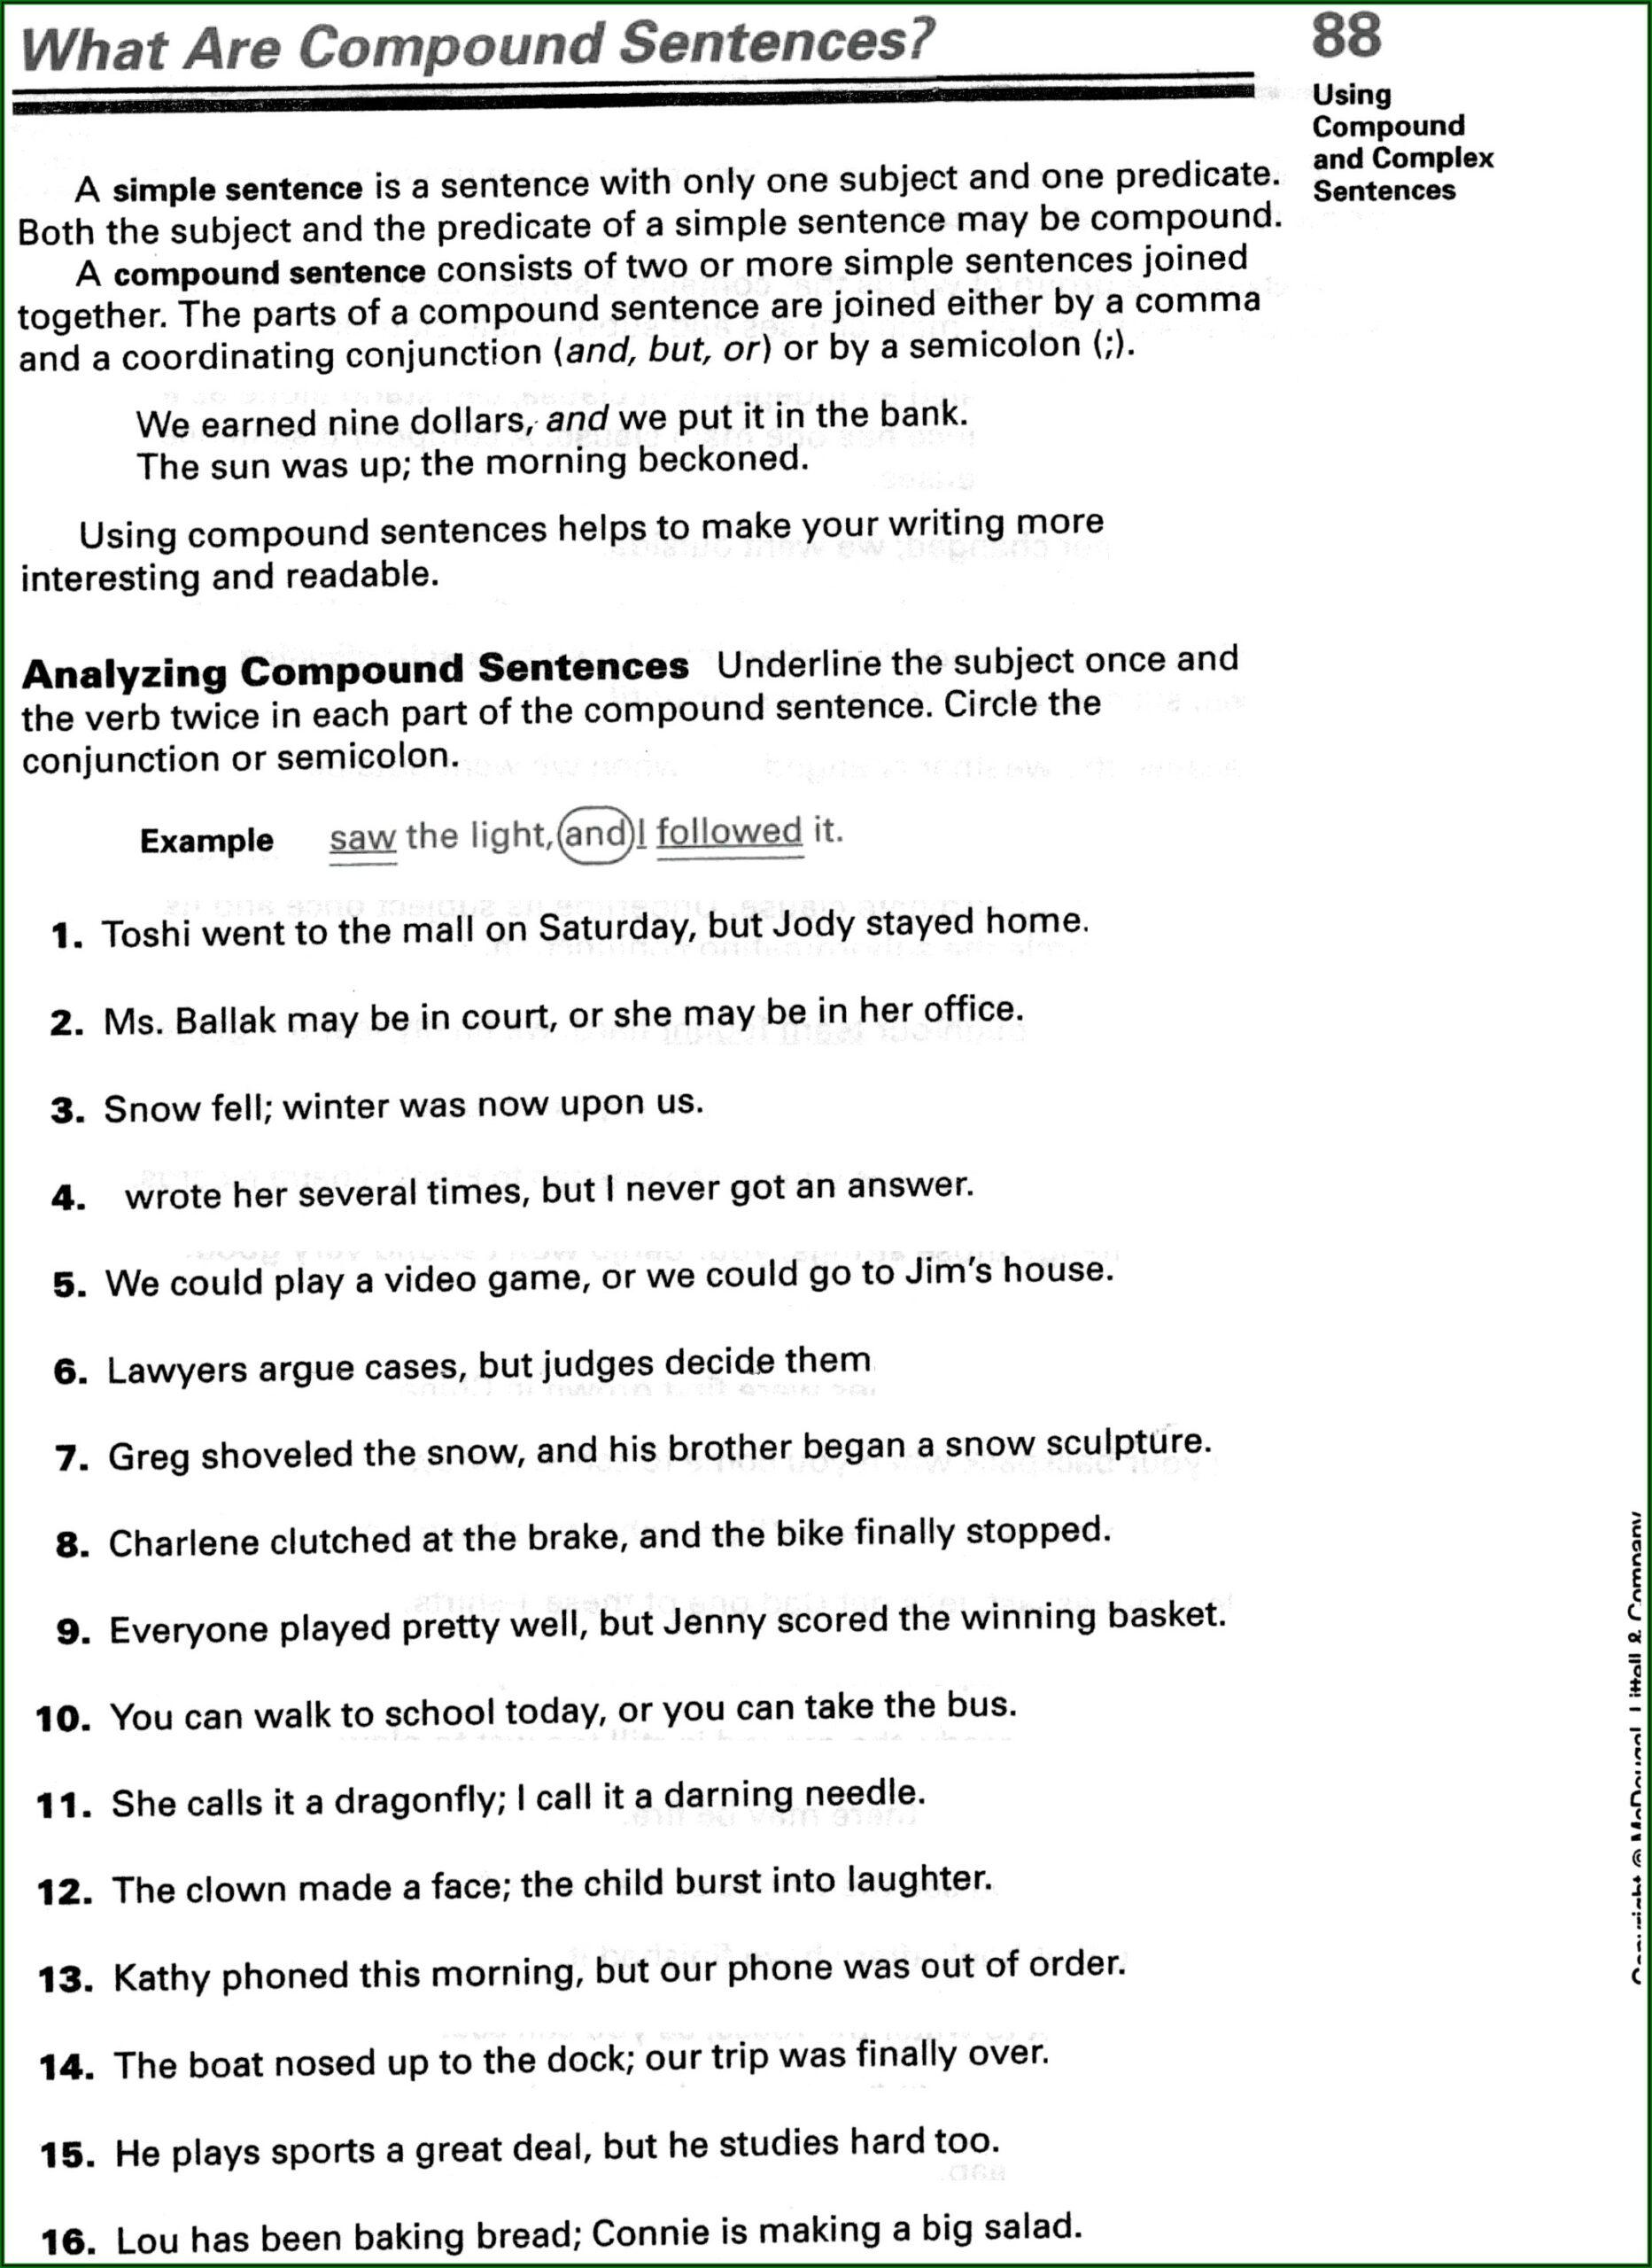 Worksheet Simple Compound And Complex Sentences